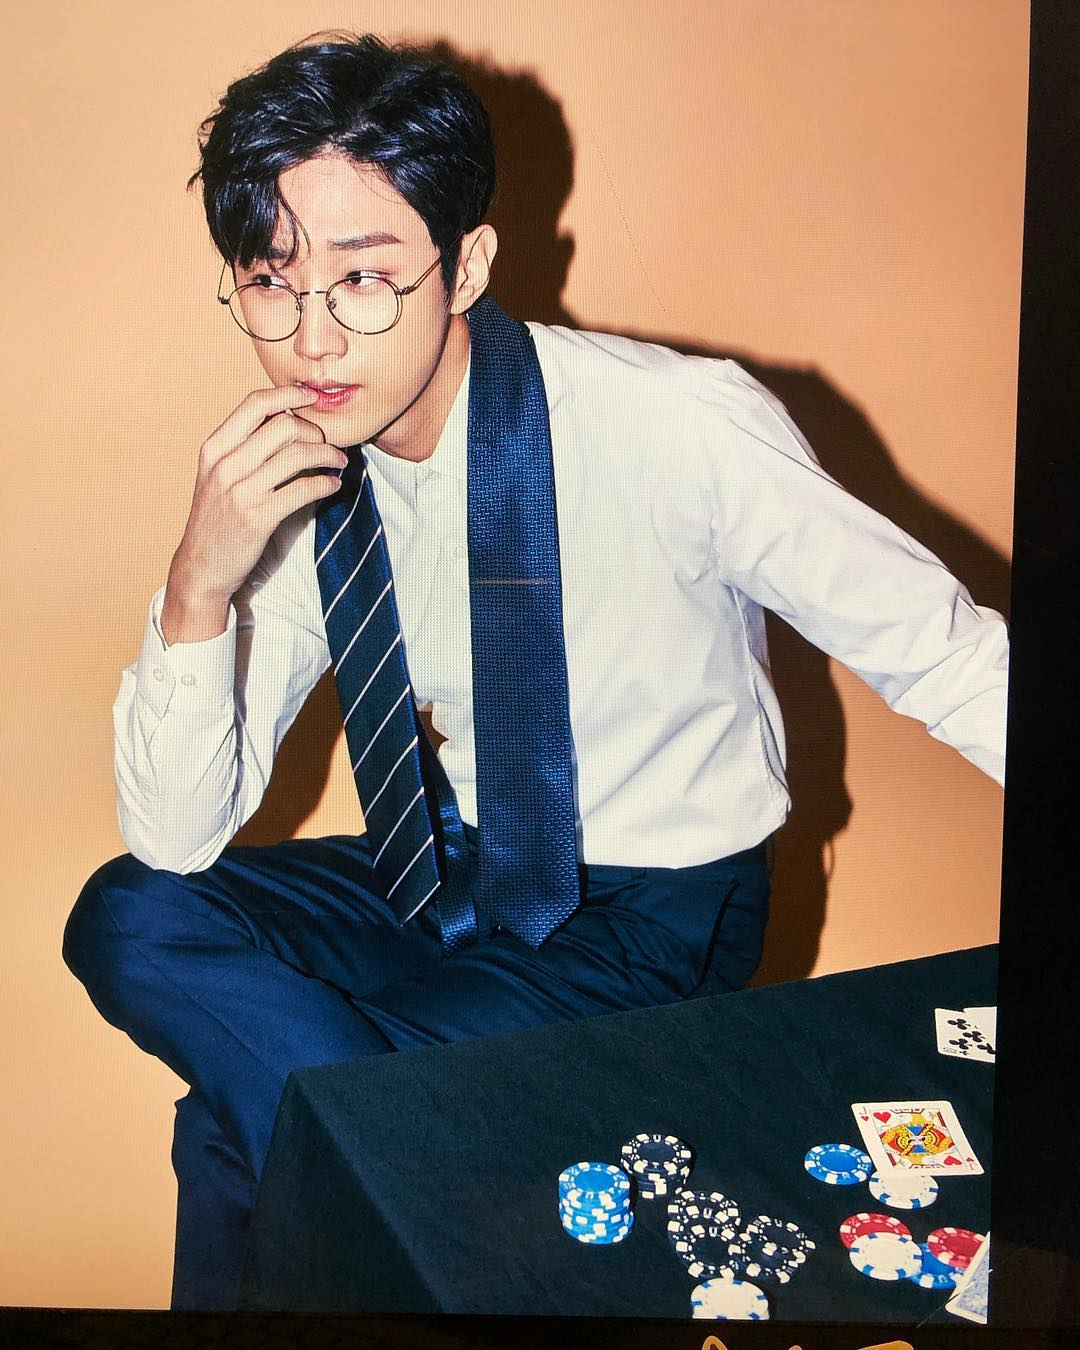 b1a4, b1a4 profile, b1a4 leader, b1a4 jinyoung, jinyoung